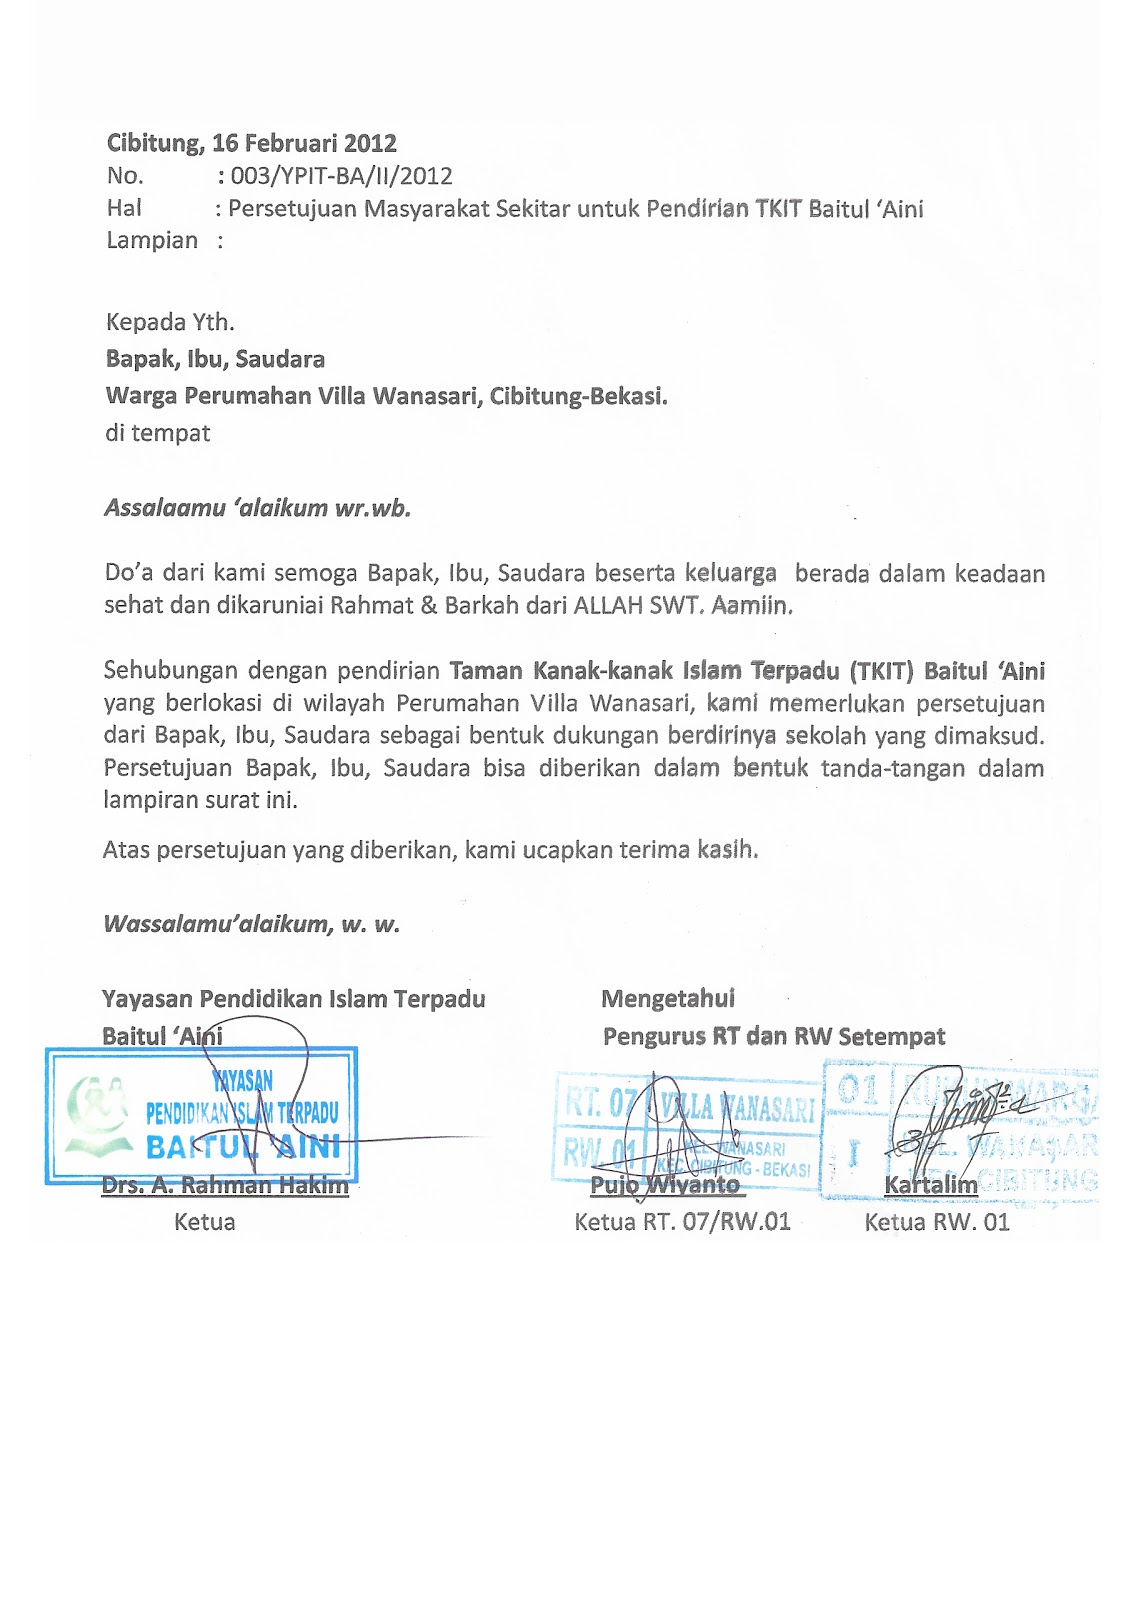 Tkit Tpq Baitul Aini Contoh Format Persetujuan Warga